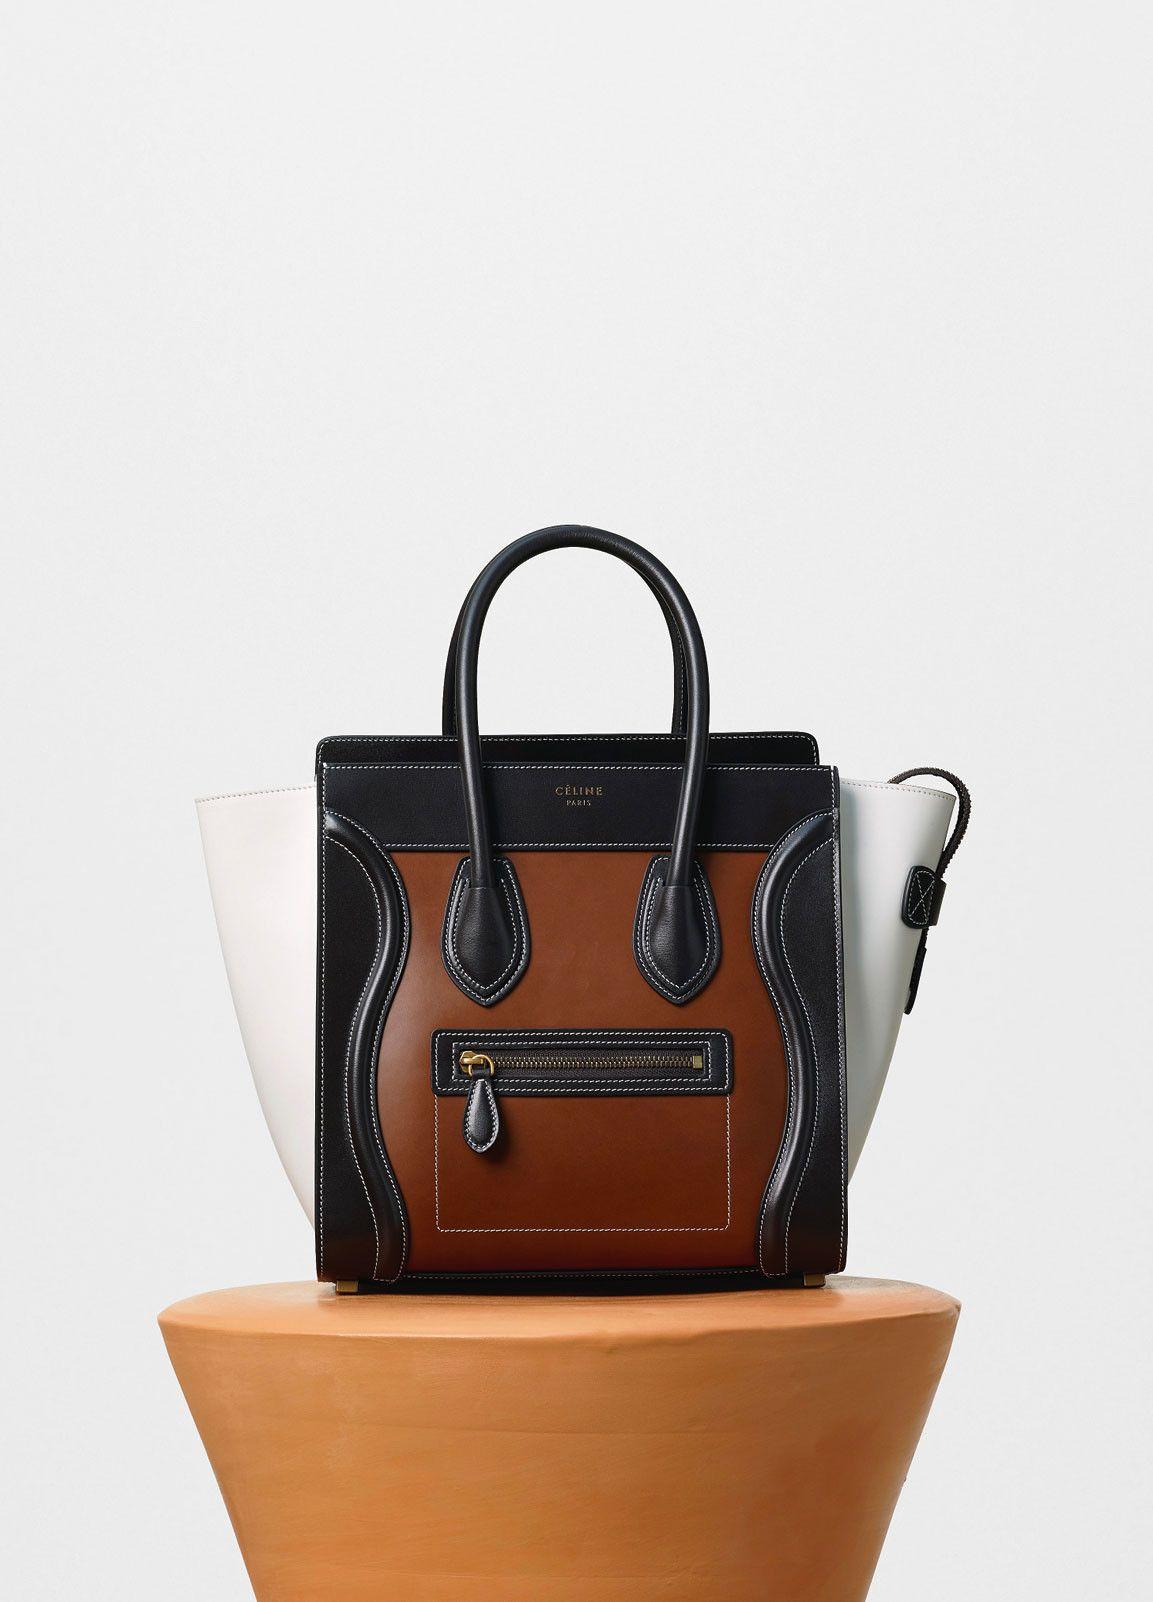 cfbf045dc8 Micro Luggage Handbag in Calfskin and Lambskin Lining - Céline ...